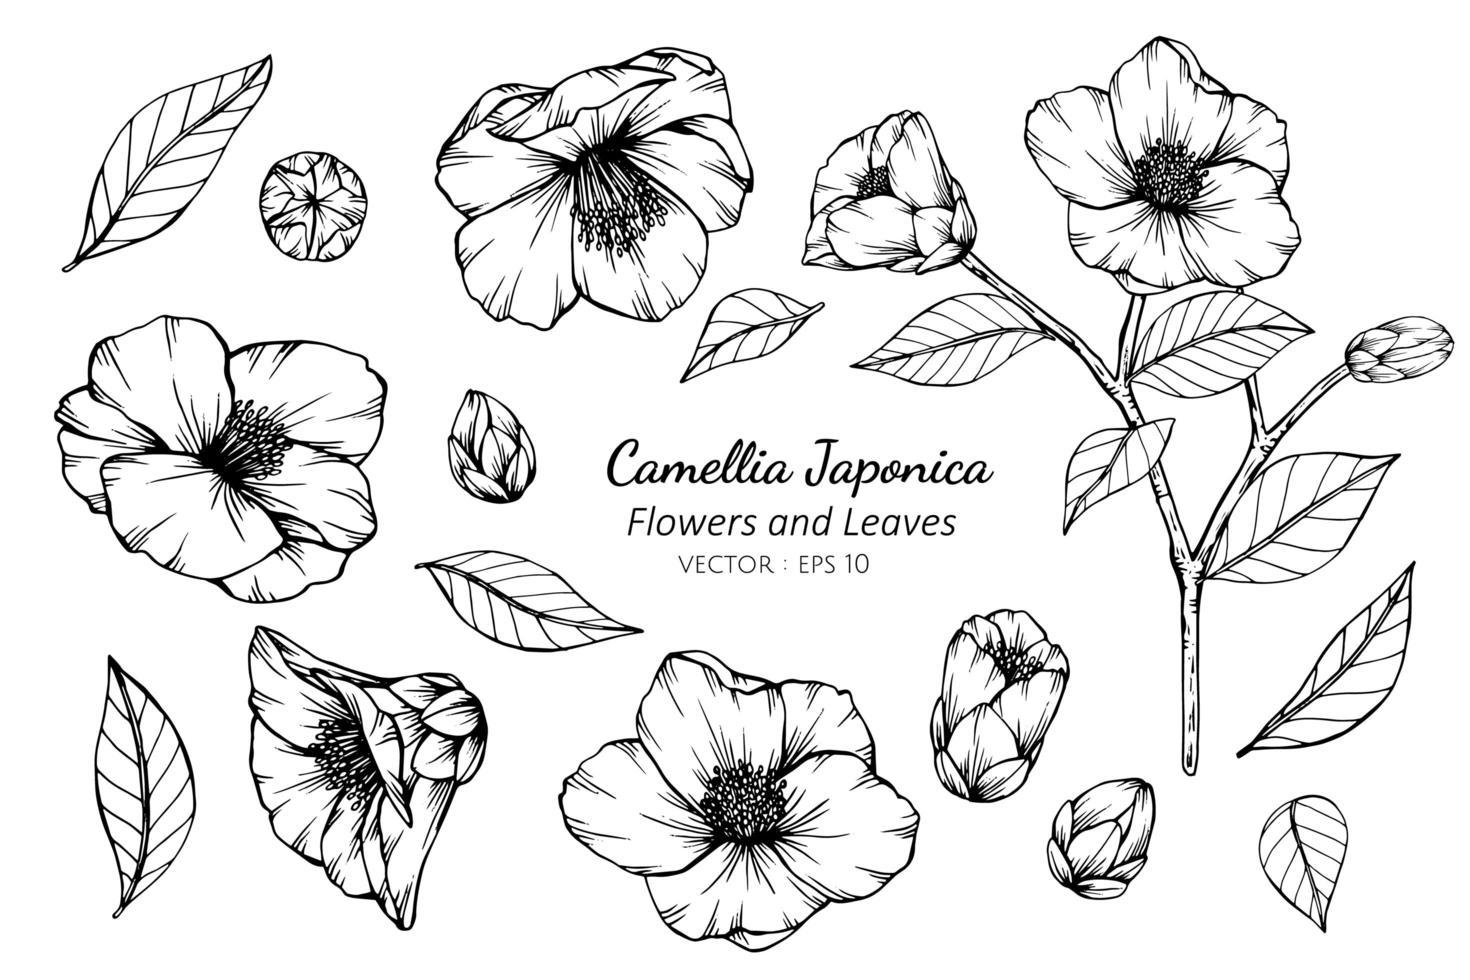 raccolta di fiori e foglie di camelia japonica vettore